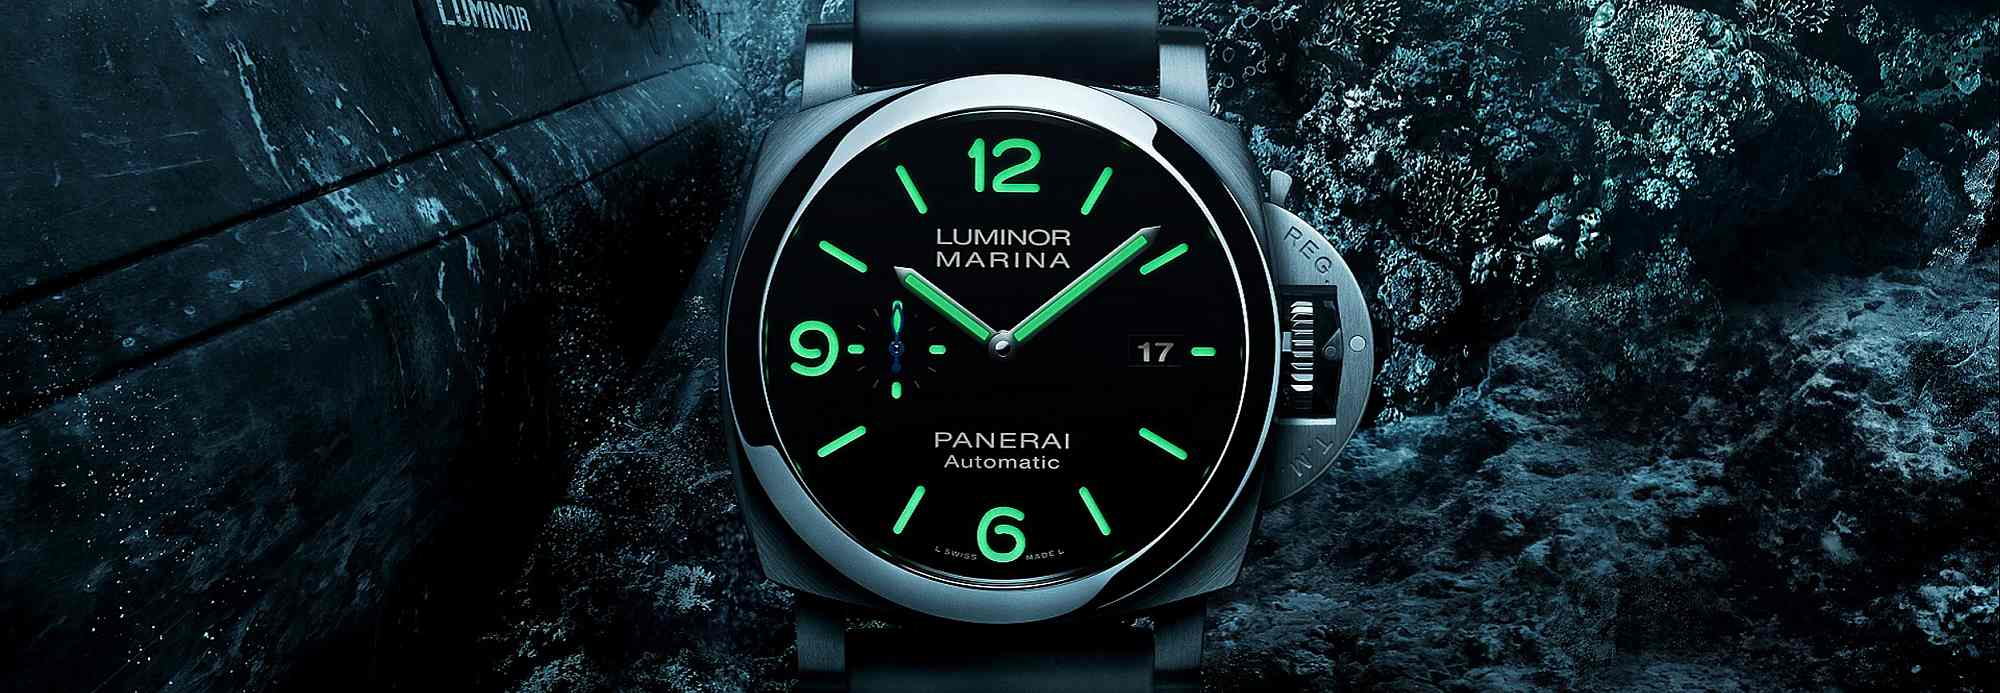 LuminorSubmarine_Hauteur_2_Normal_Full---